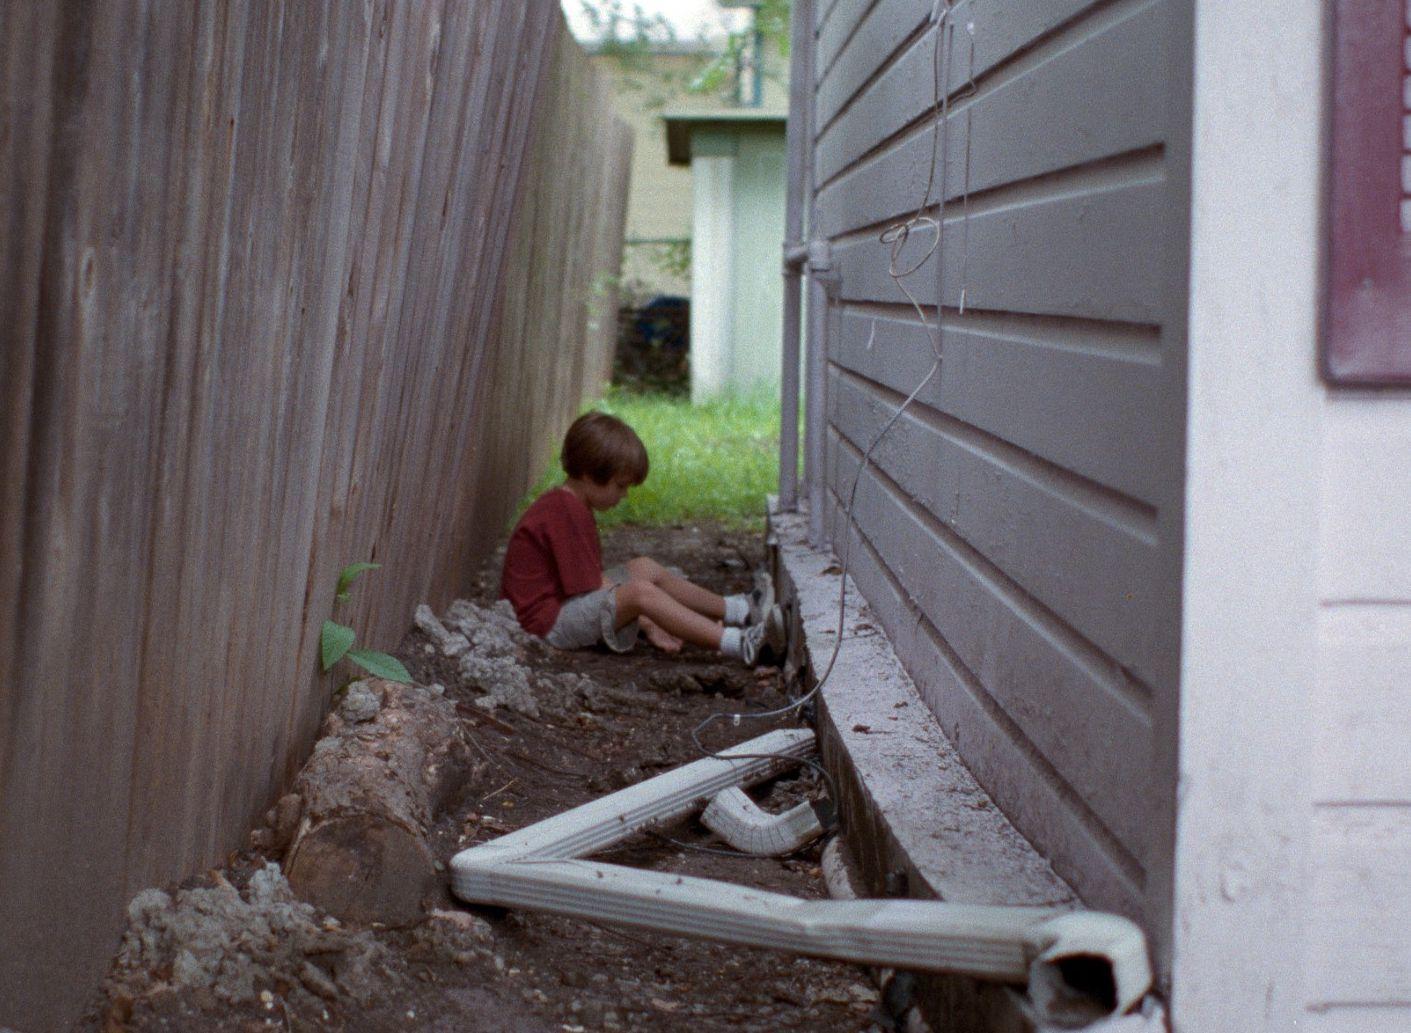 Ellar Coltrane as Mason in Richard Linklater's Boyhood